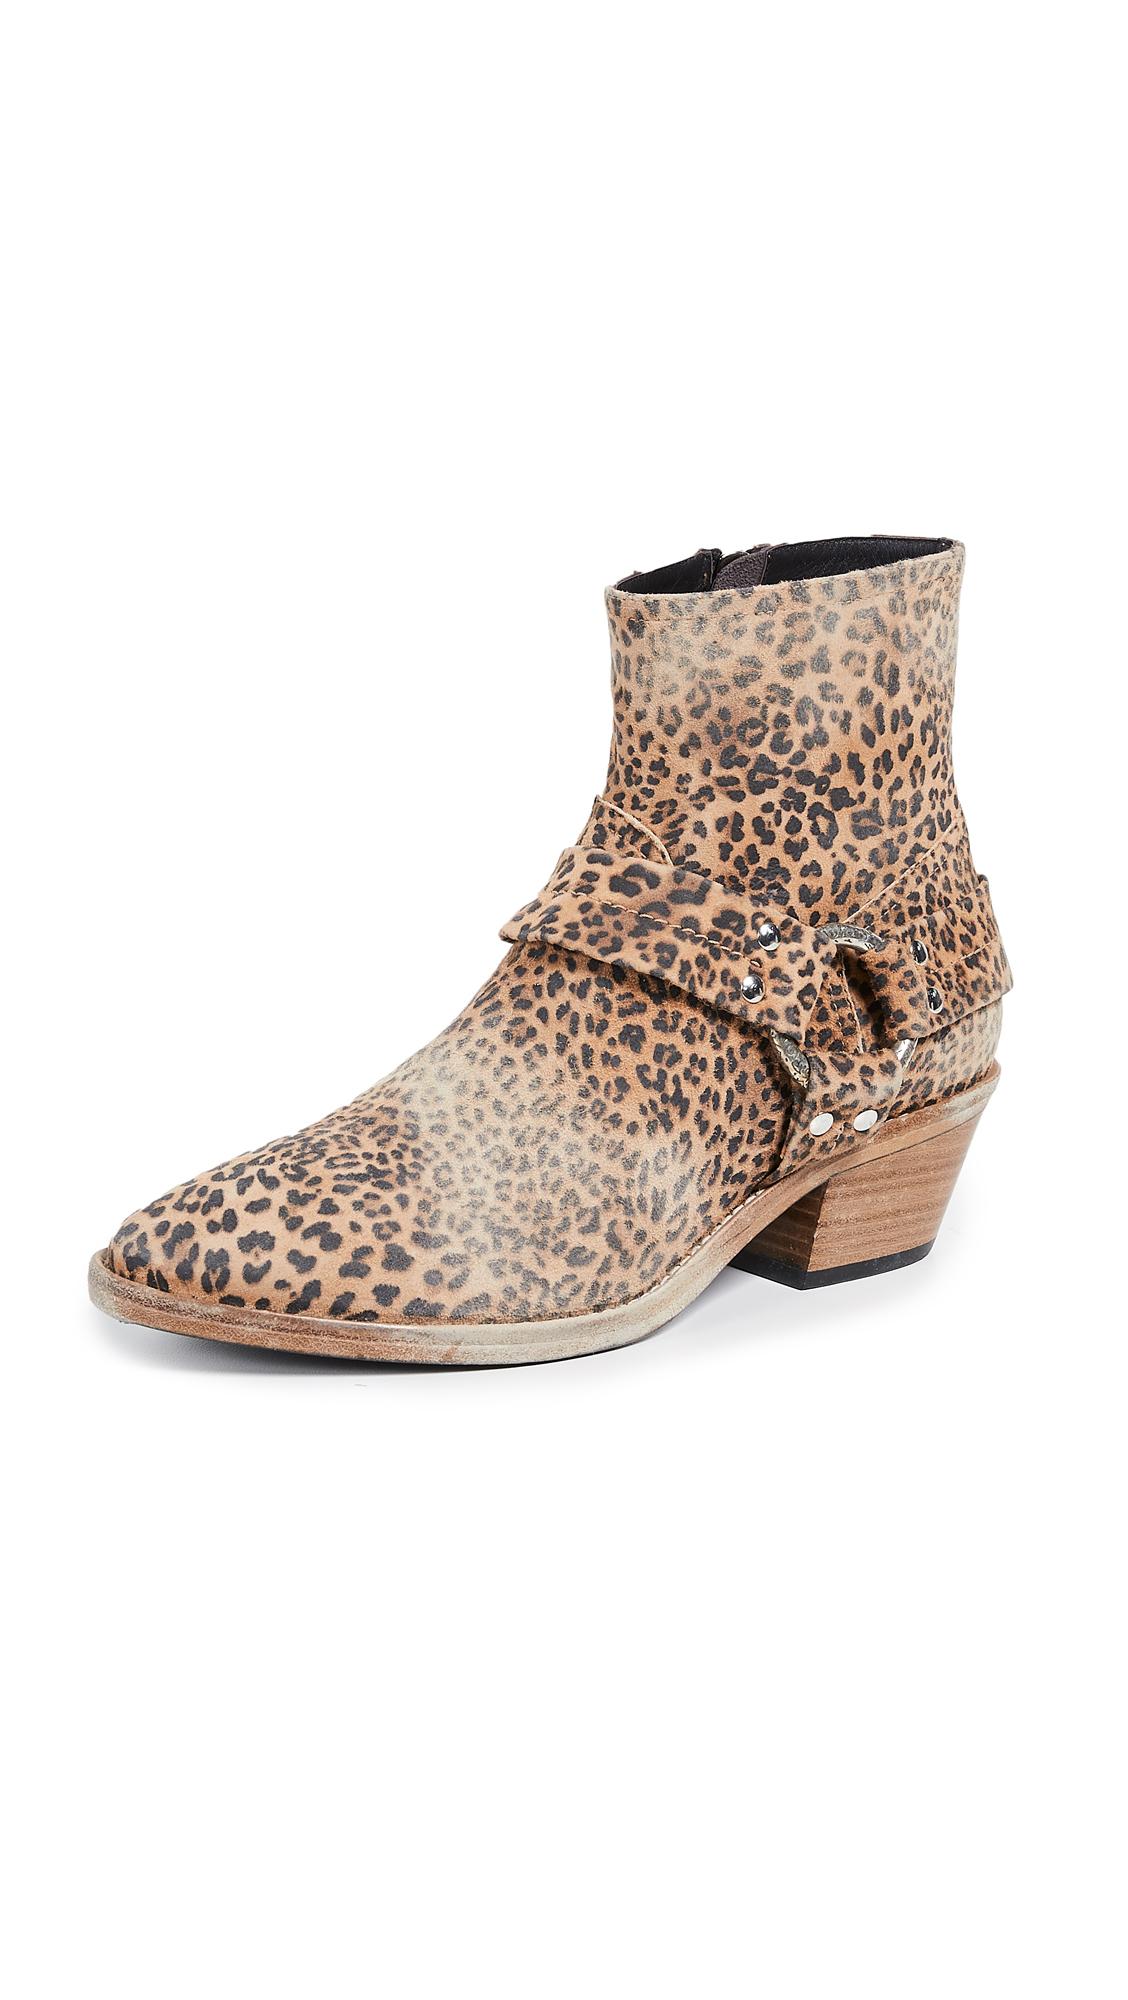 Golden Goose Bretagne Boots - Leopard